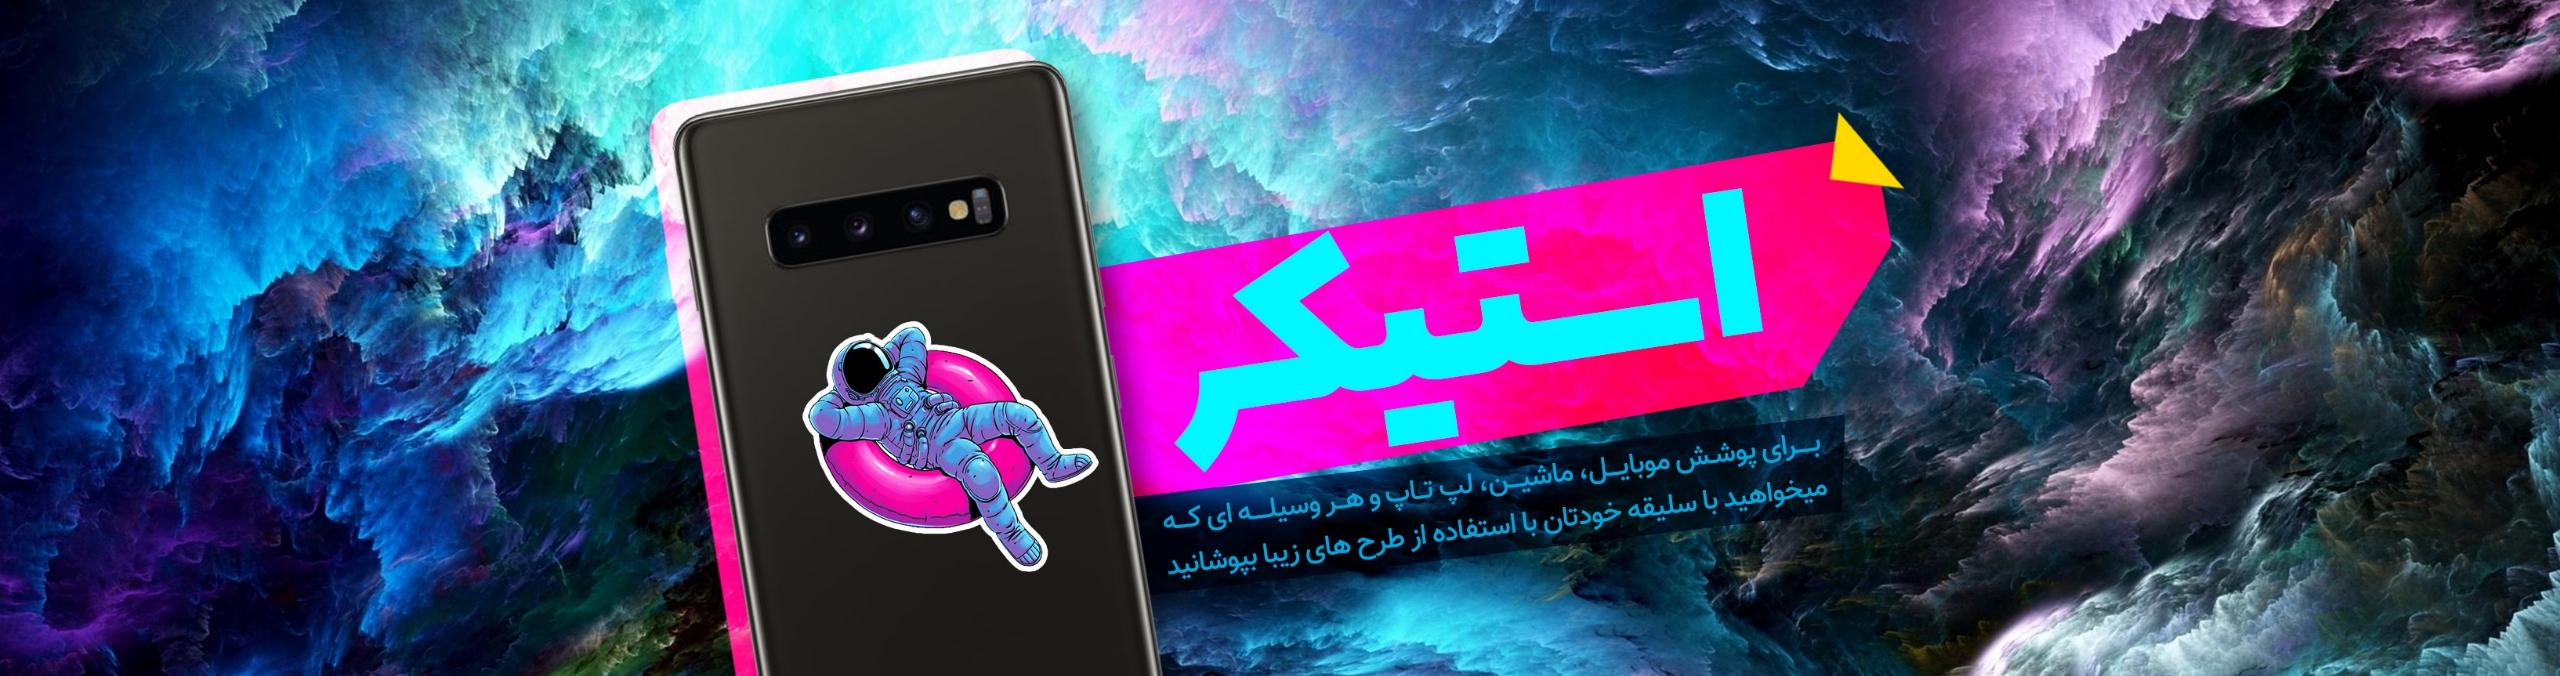 B (@badrooz) Cover Image